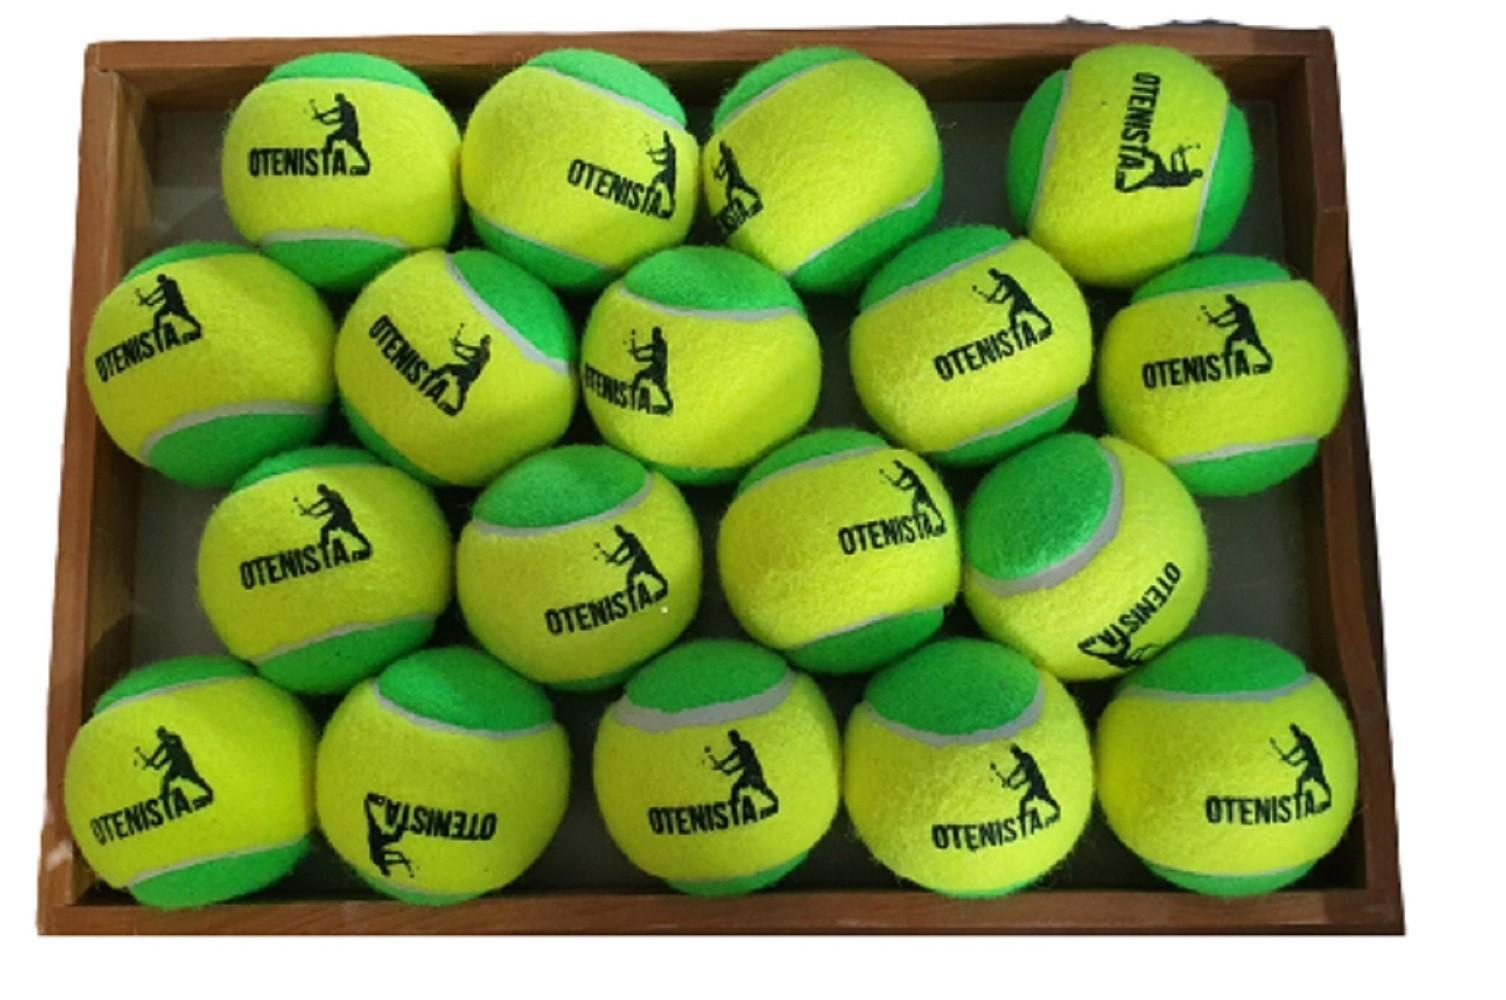 Bola de Tenis Kid Estagio 1 - Saco Com 18 Bolas